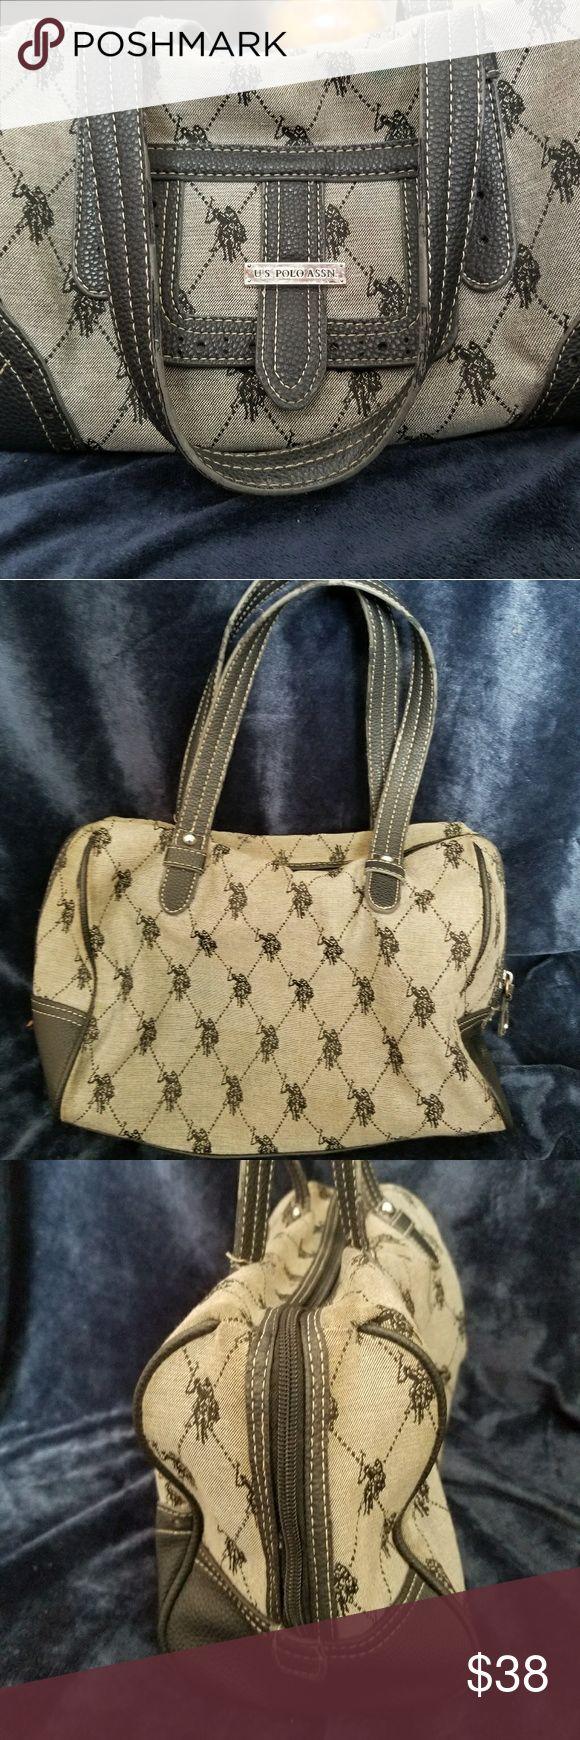 U.S. Polo Assn handbag Grey and Black U.S Polo Assn Bag U.S. Polo Assn. Bags Satchels